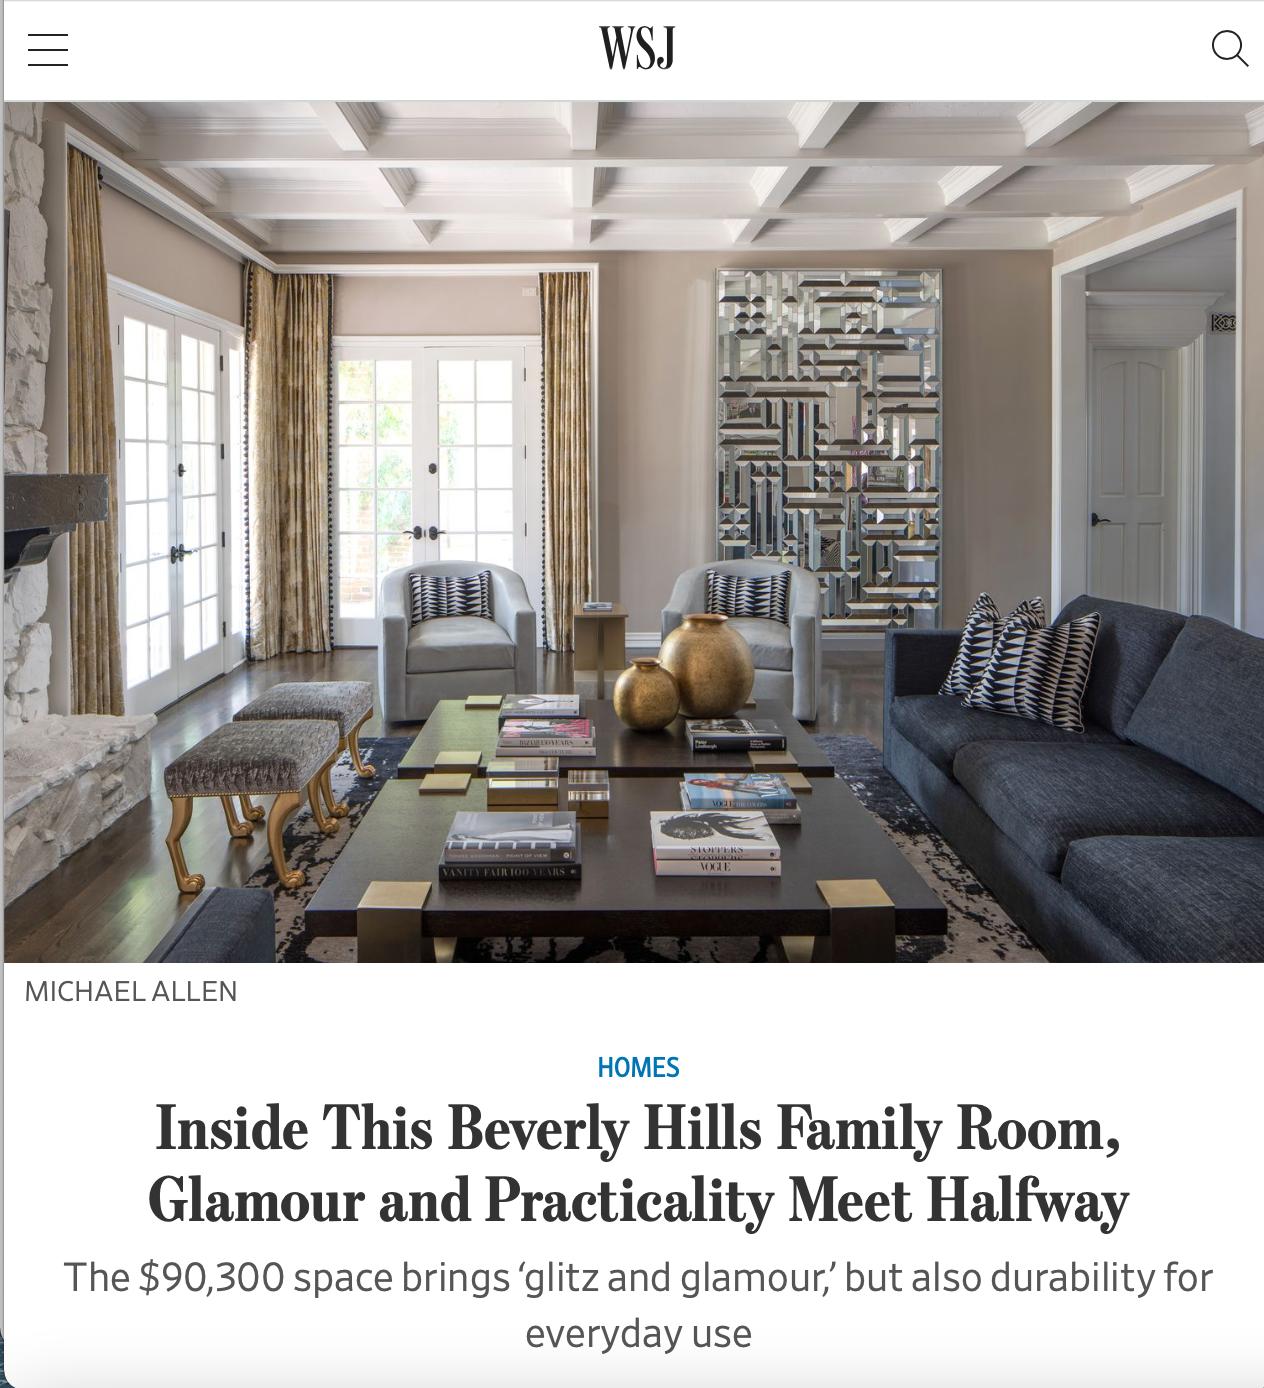 Ryan Saghian, Rima Suqi, Wall Street Journal, Annotated Room